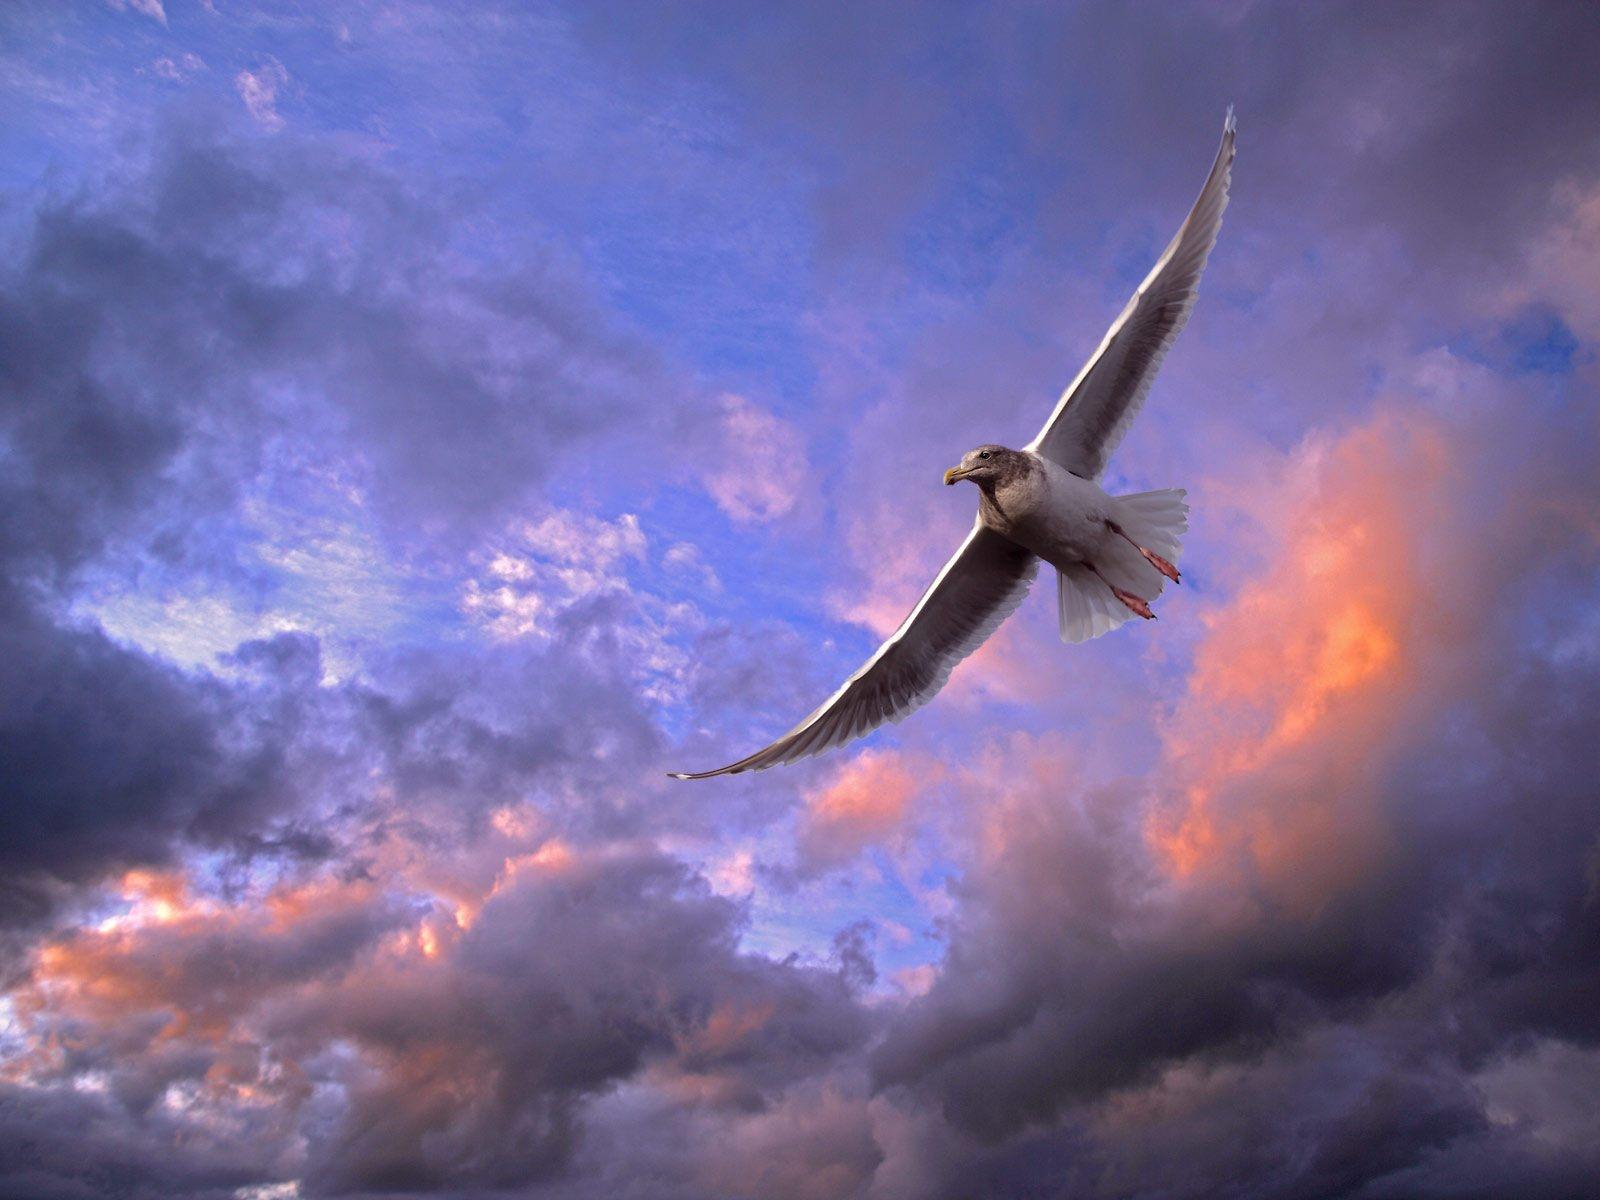 http://www.zastavki.com/pictures/1600x1200/2009/Animals_Birds_A_bird_in_the_sky_019244_.jpg